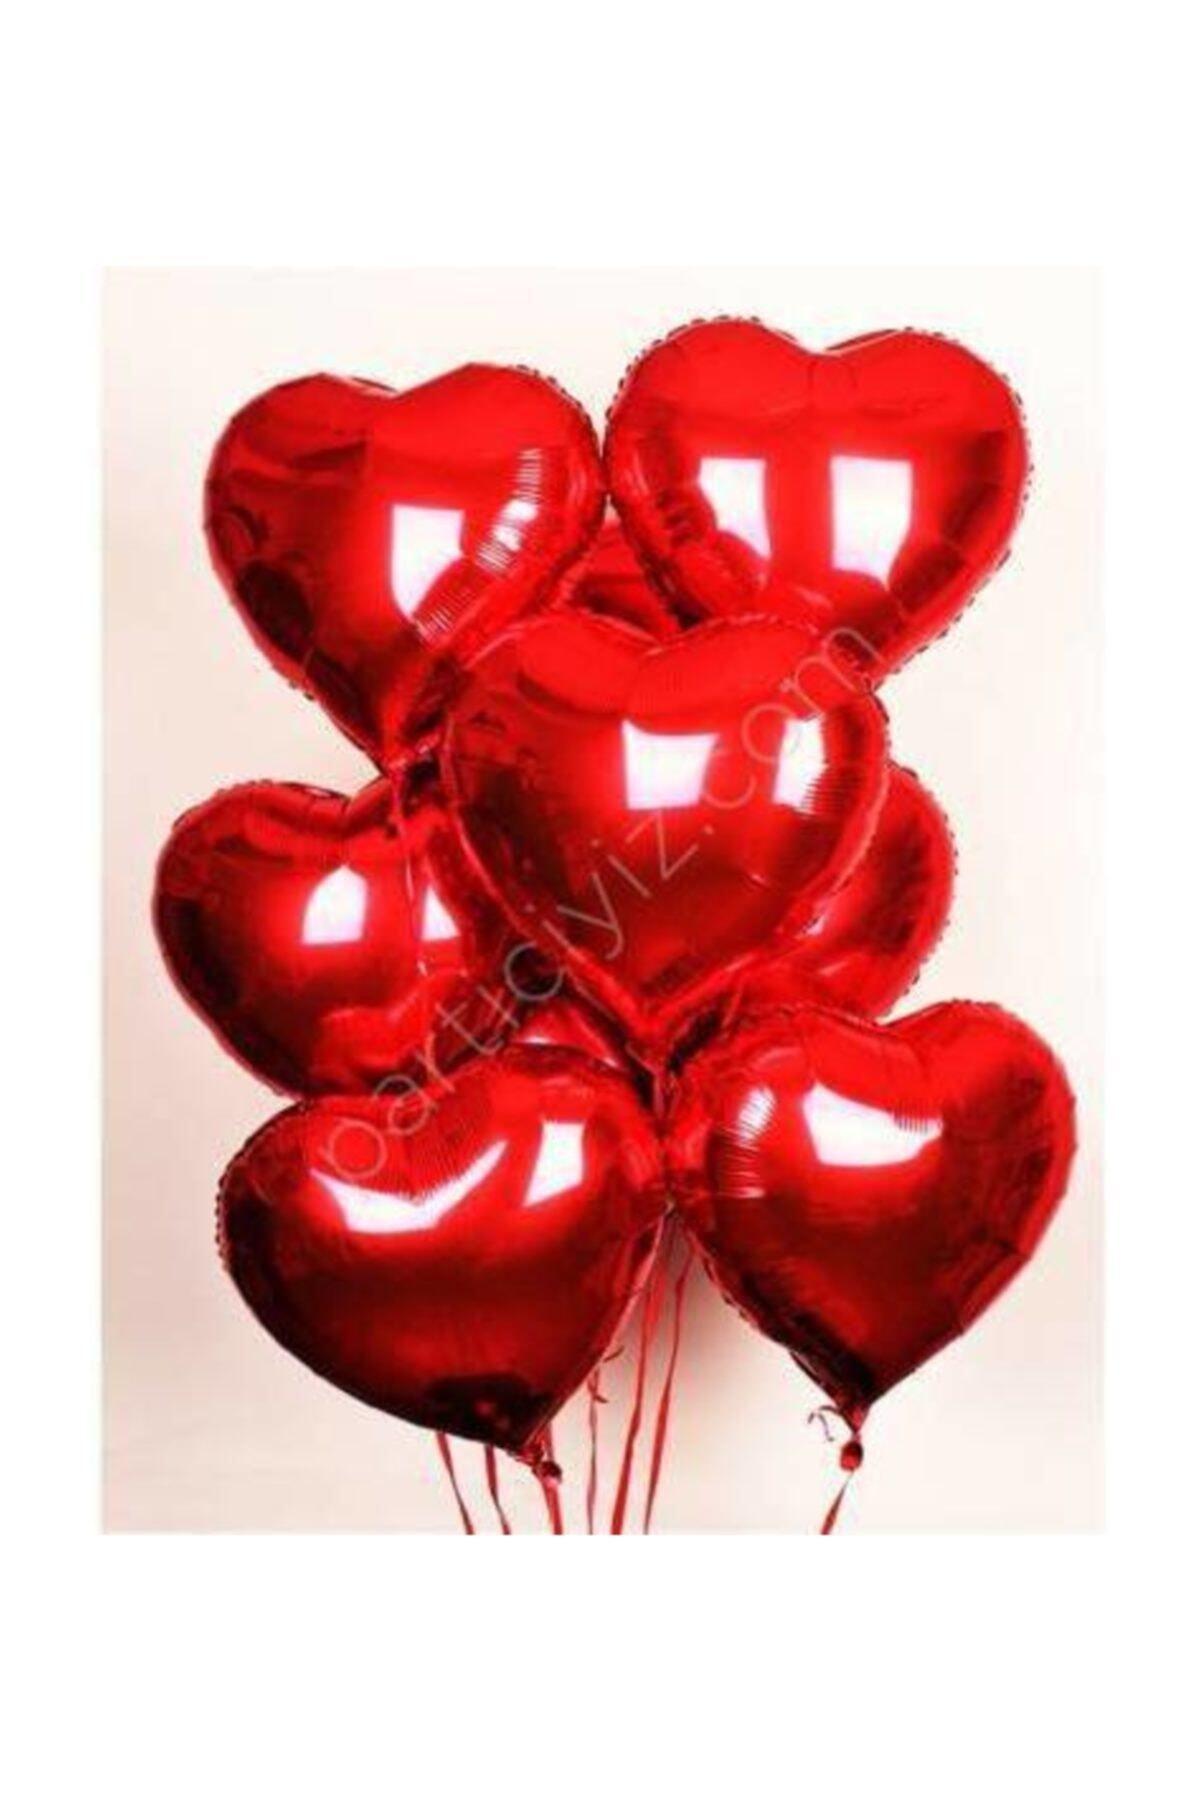 Kalp Folyo Balon 40 Cm 10 Adet Kalp Folyo Balon Seti Kalpli Balon Folyo 40 Cm 10 Adet Fiyatıdır